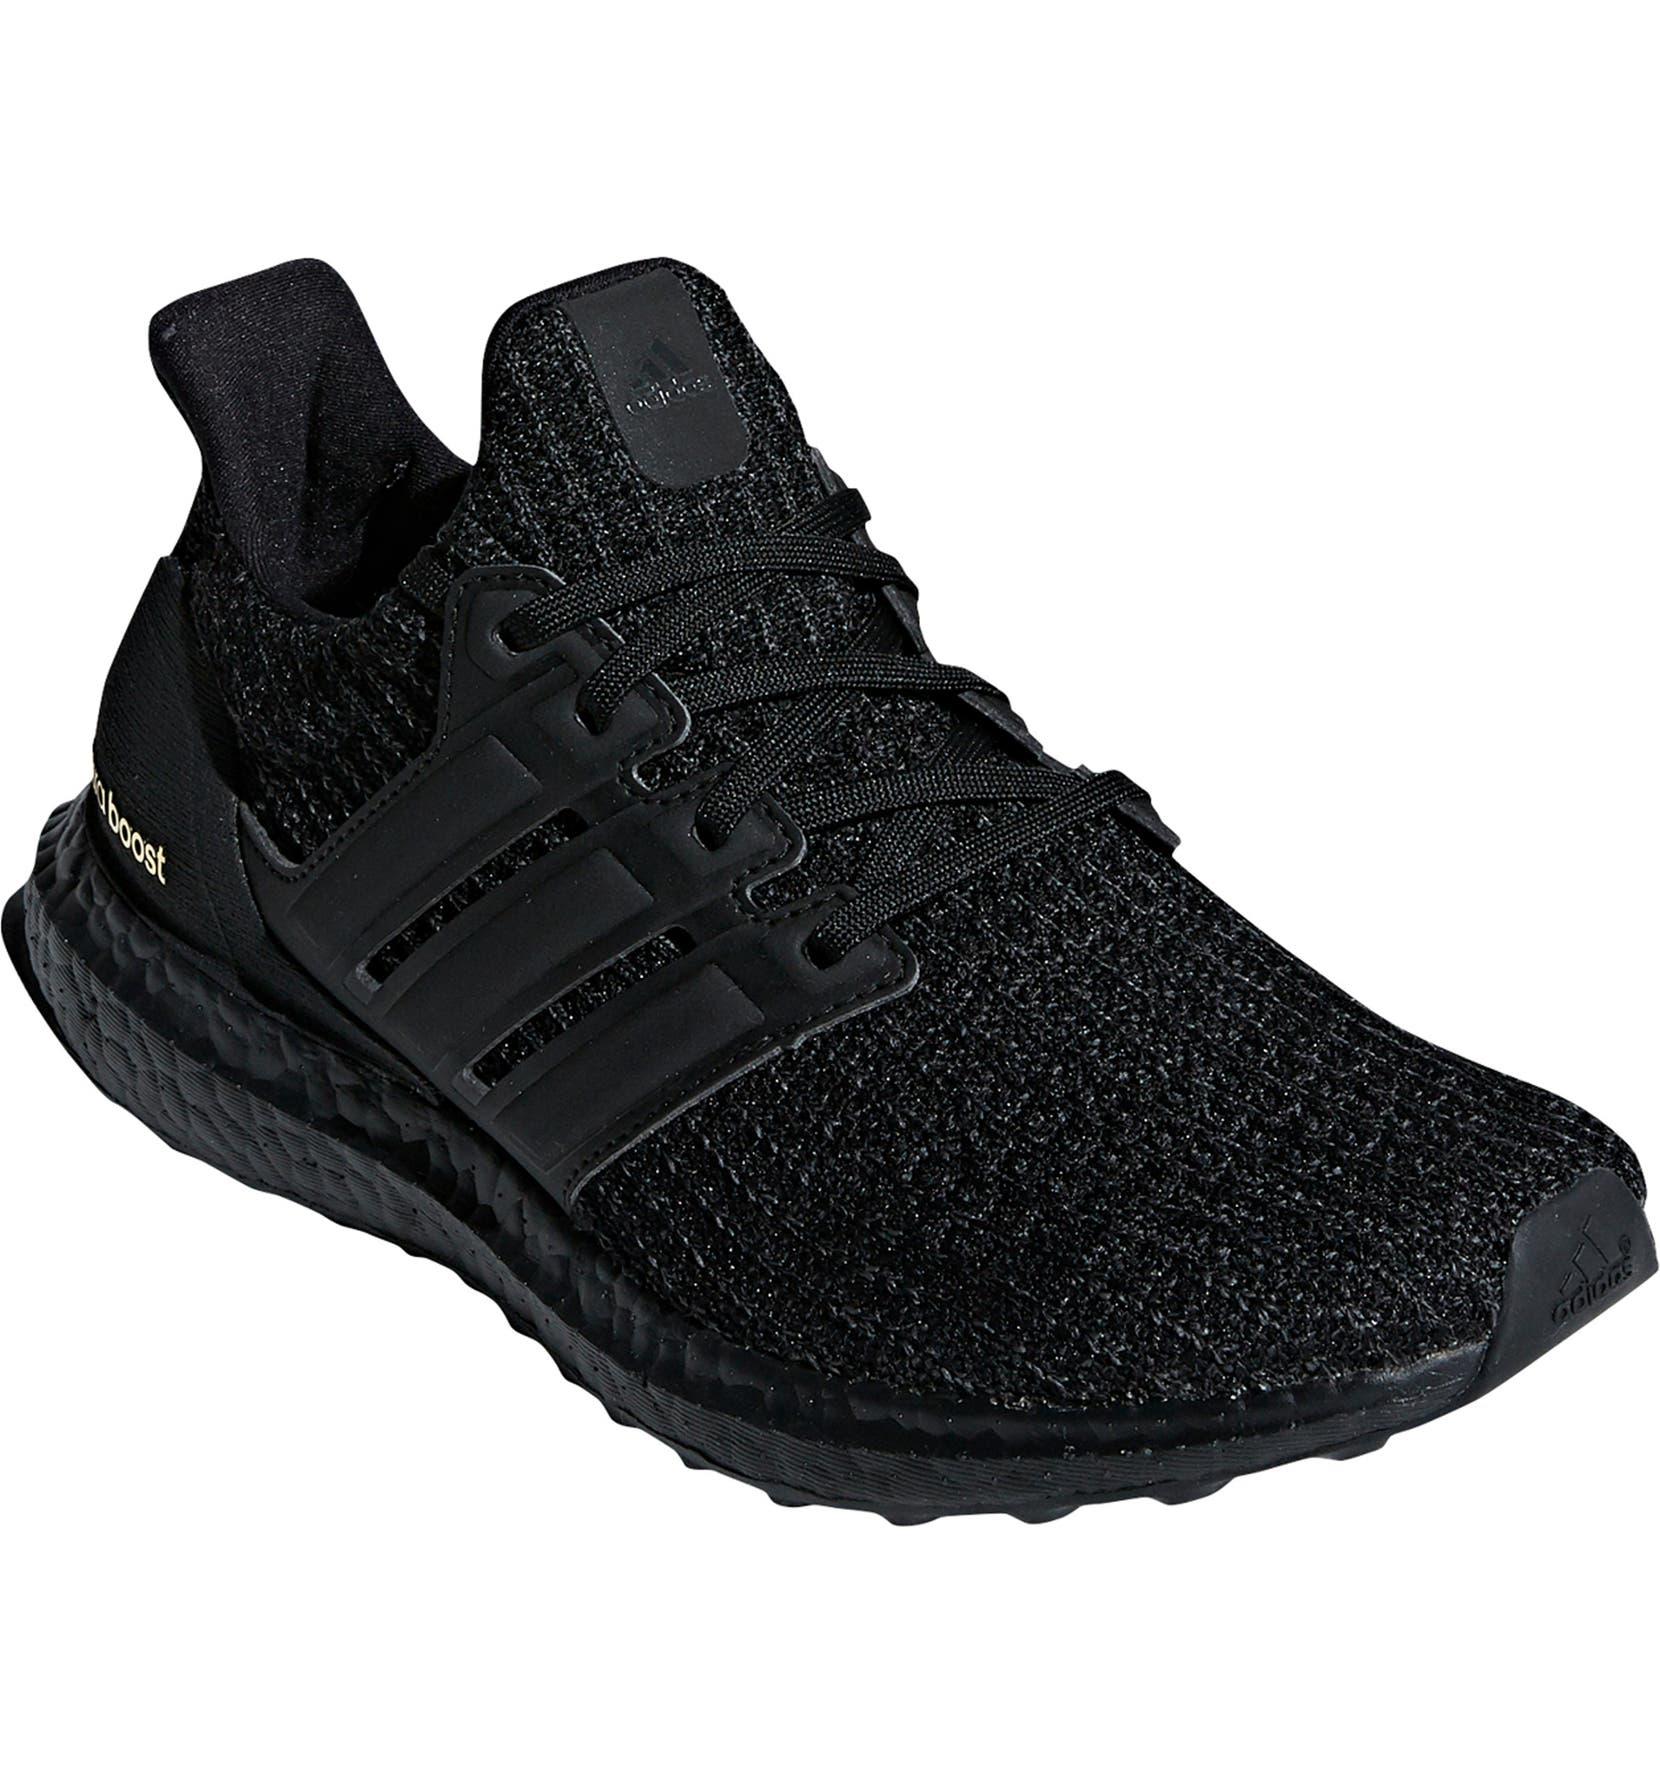 on sale be7fe 3d580 adidas  UltraBoost  Running Shoe (Women)   Nordstrom